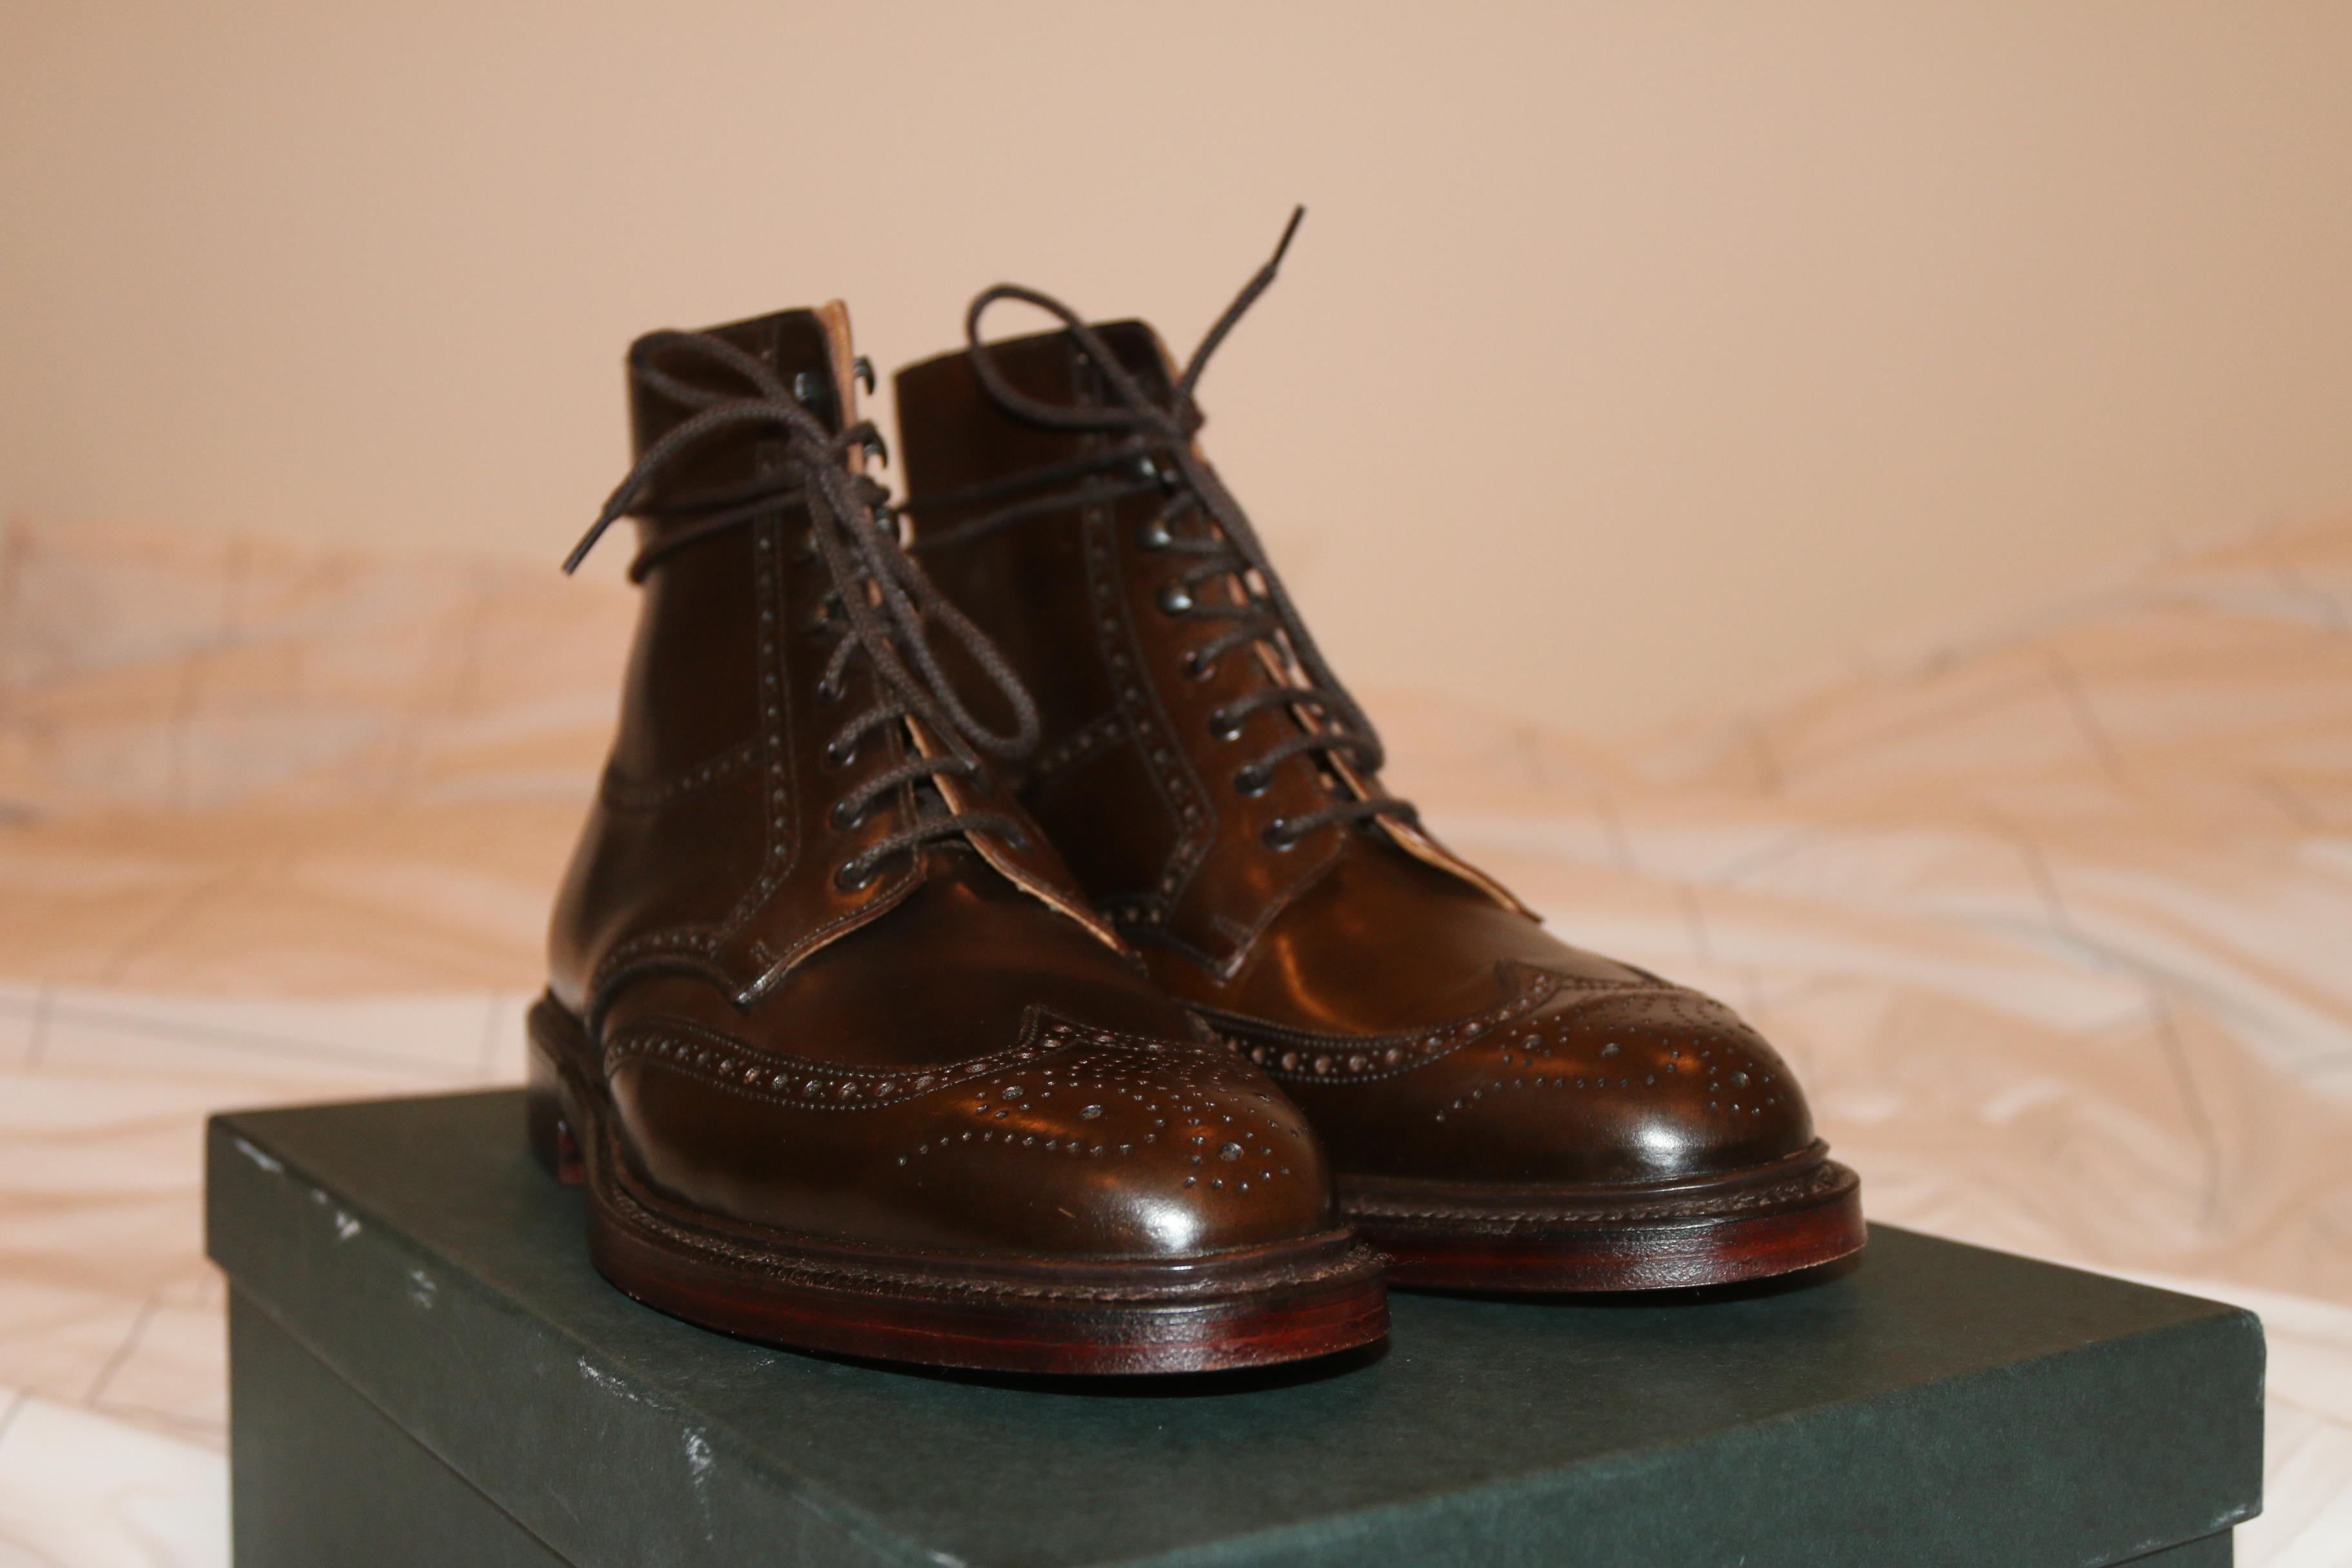 FS: BRAND NEW Crockett Jones Lindrick Boot Brown Shell ...